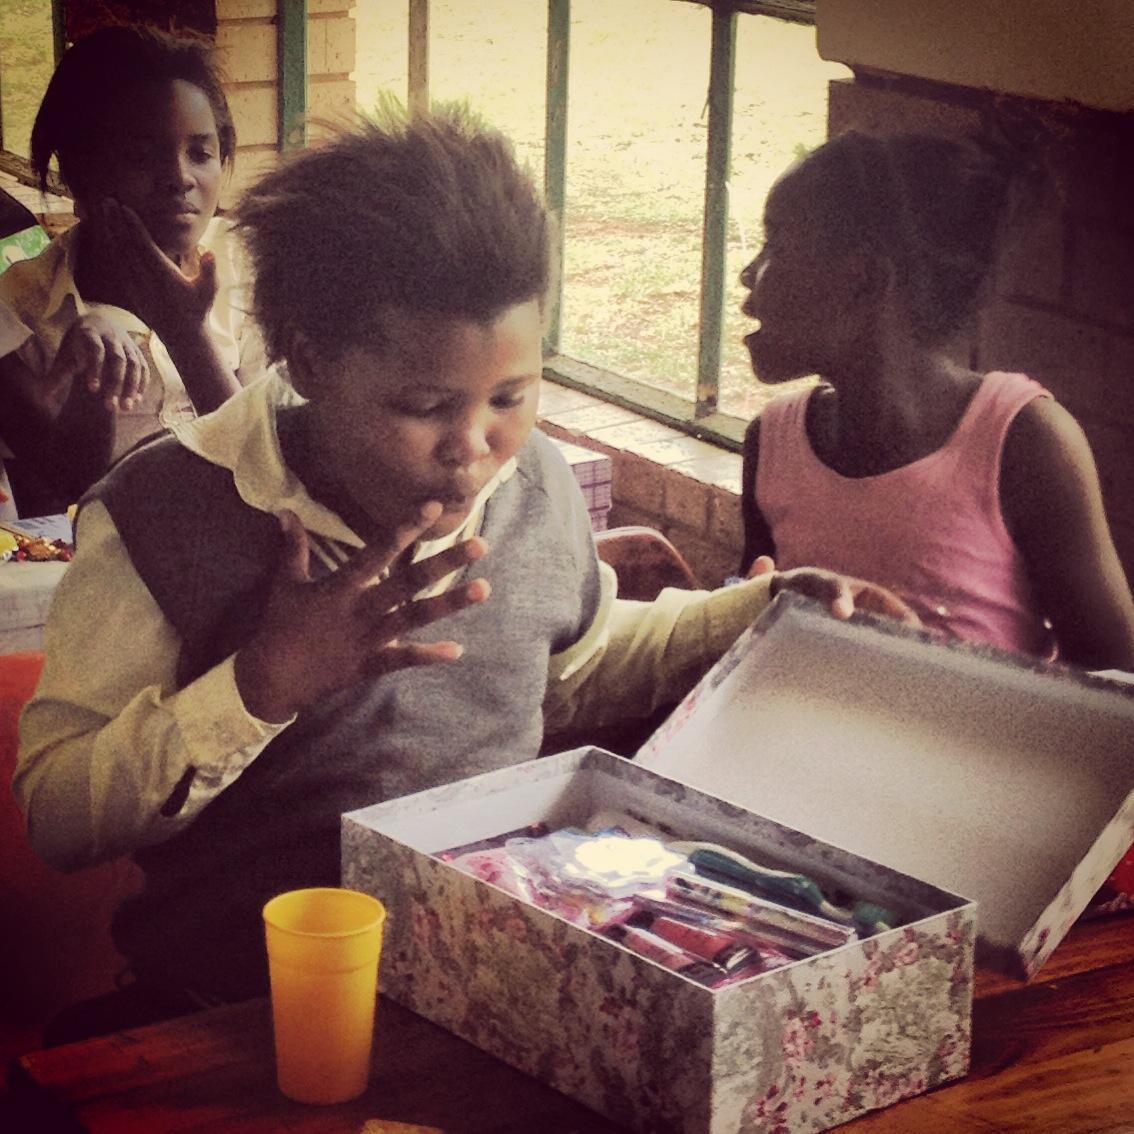 Giving Back - Santashoebox Project|HarassedMom